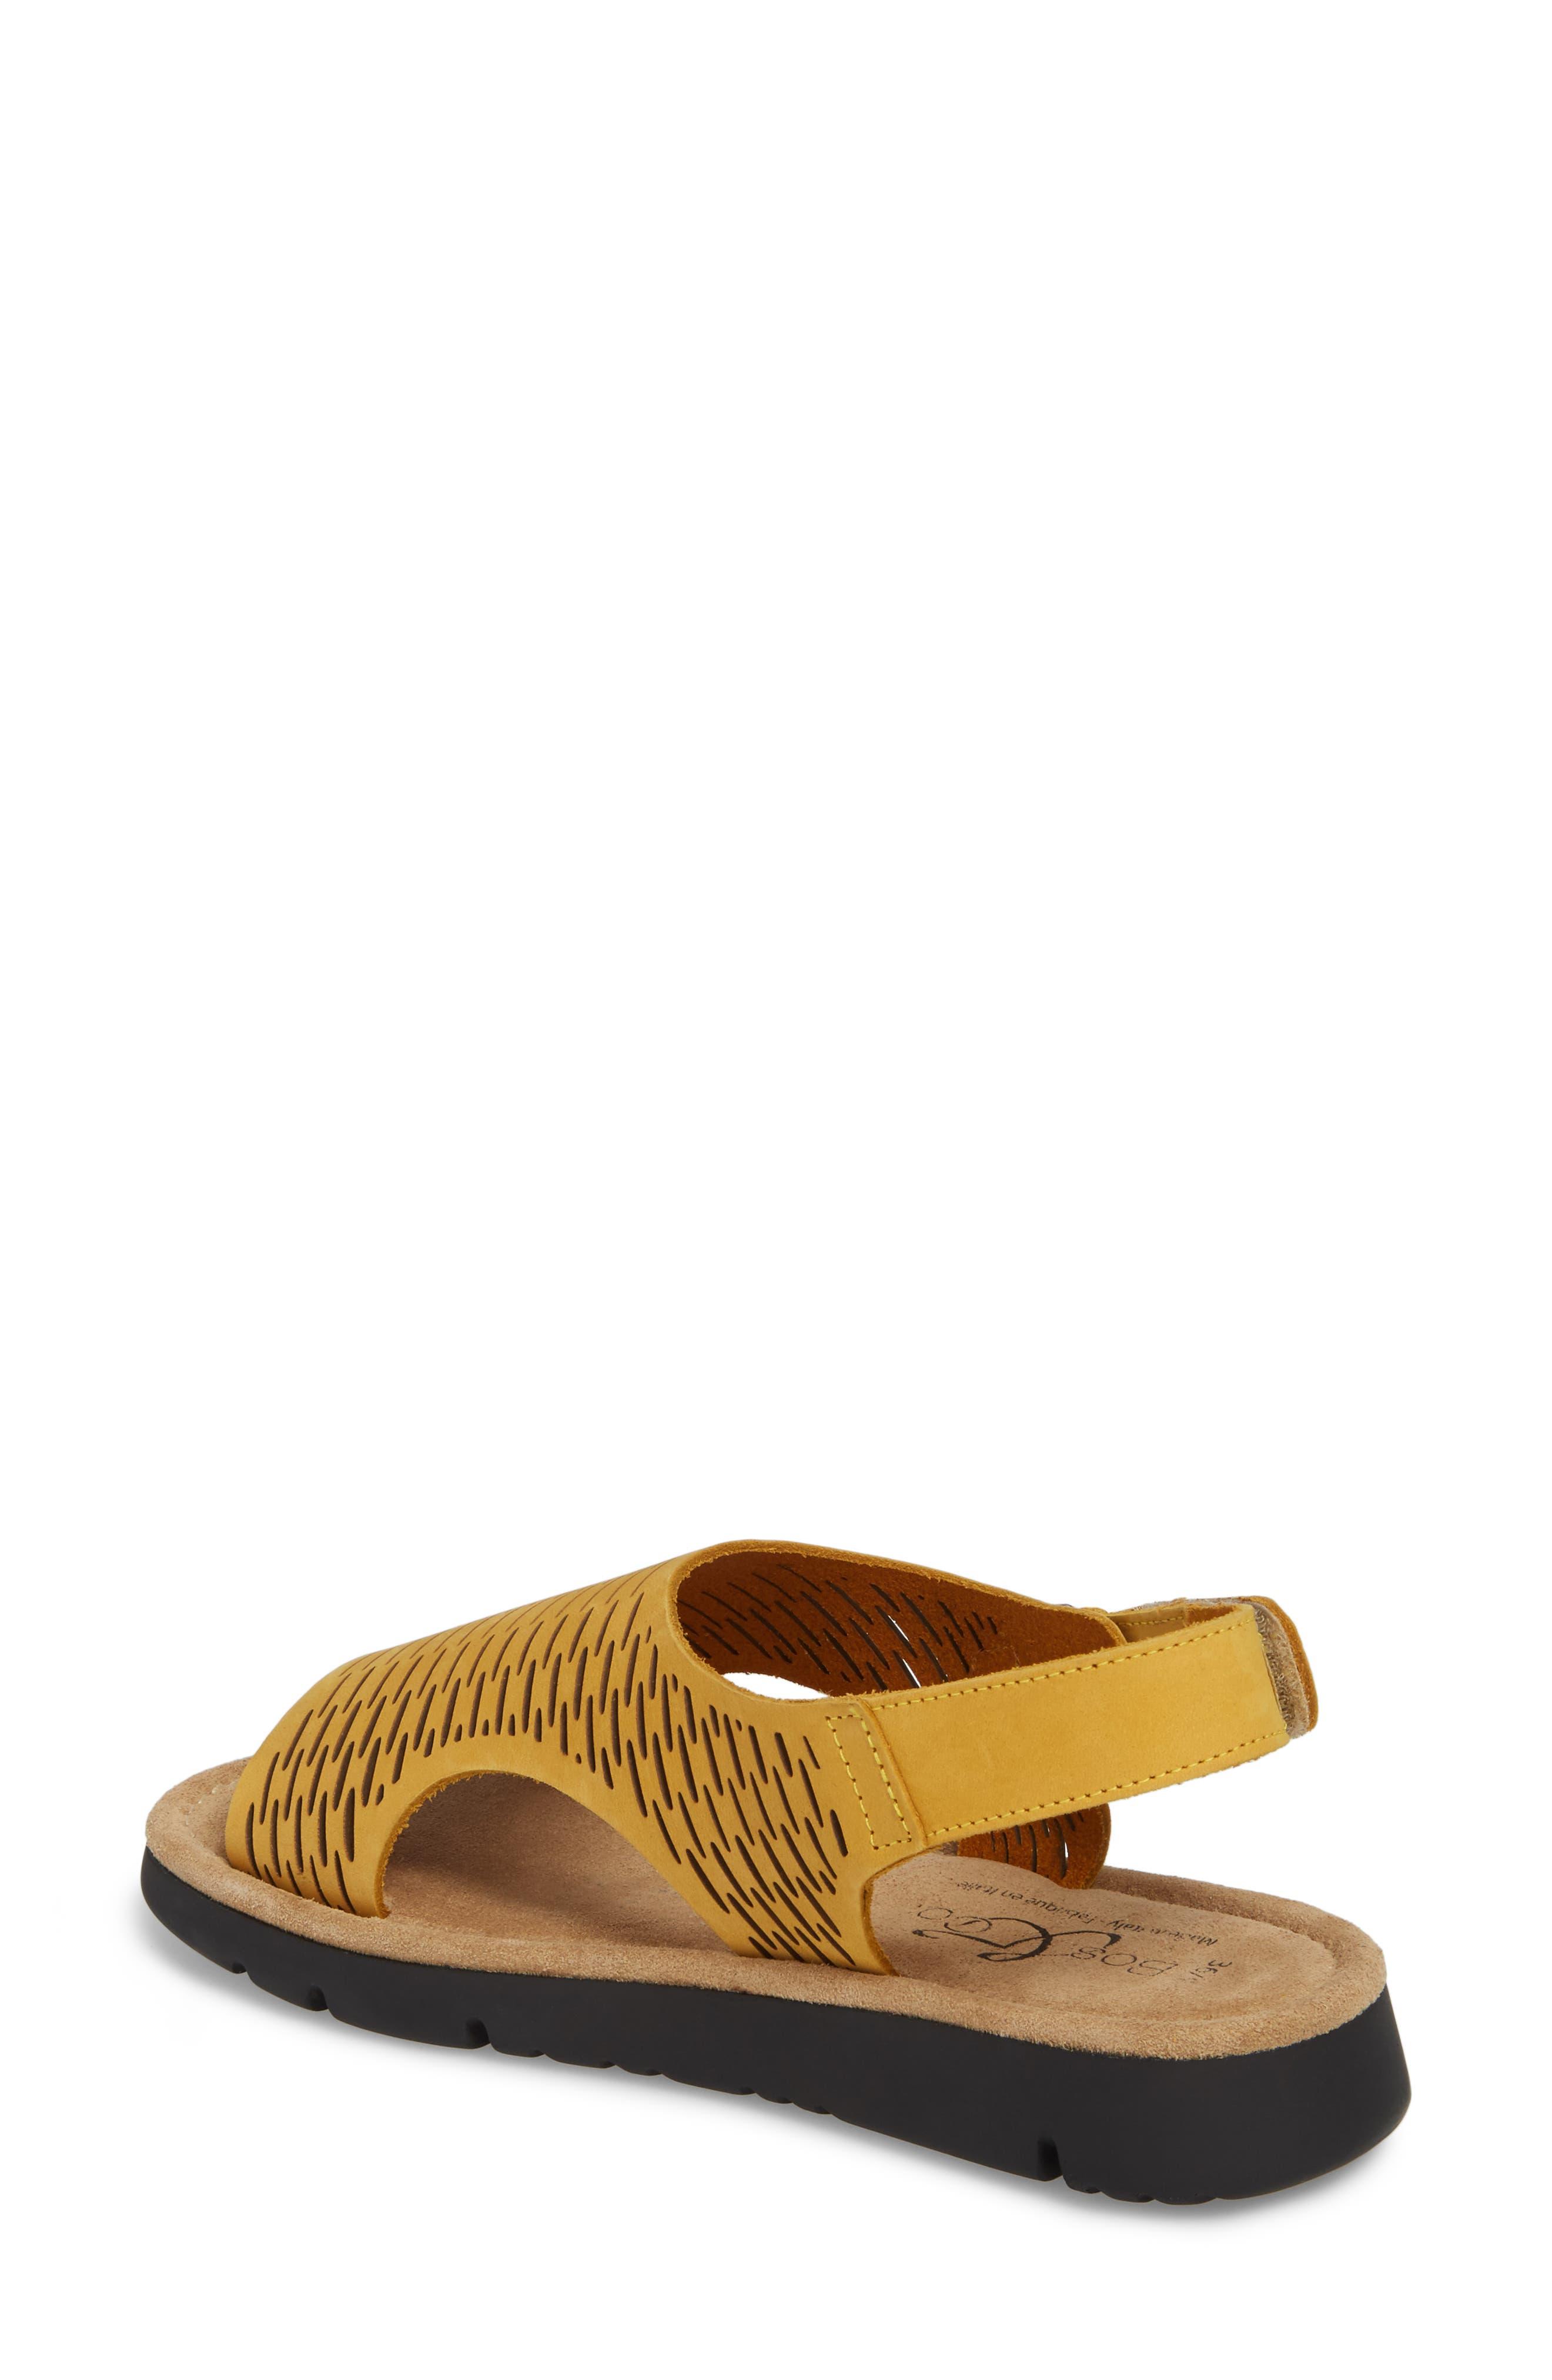 Saga Sandal,                             Alternate thumbnail 2, color,                             Mustard Nubuck Leather